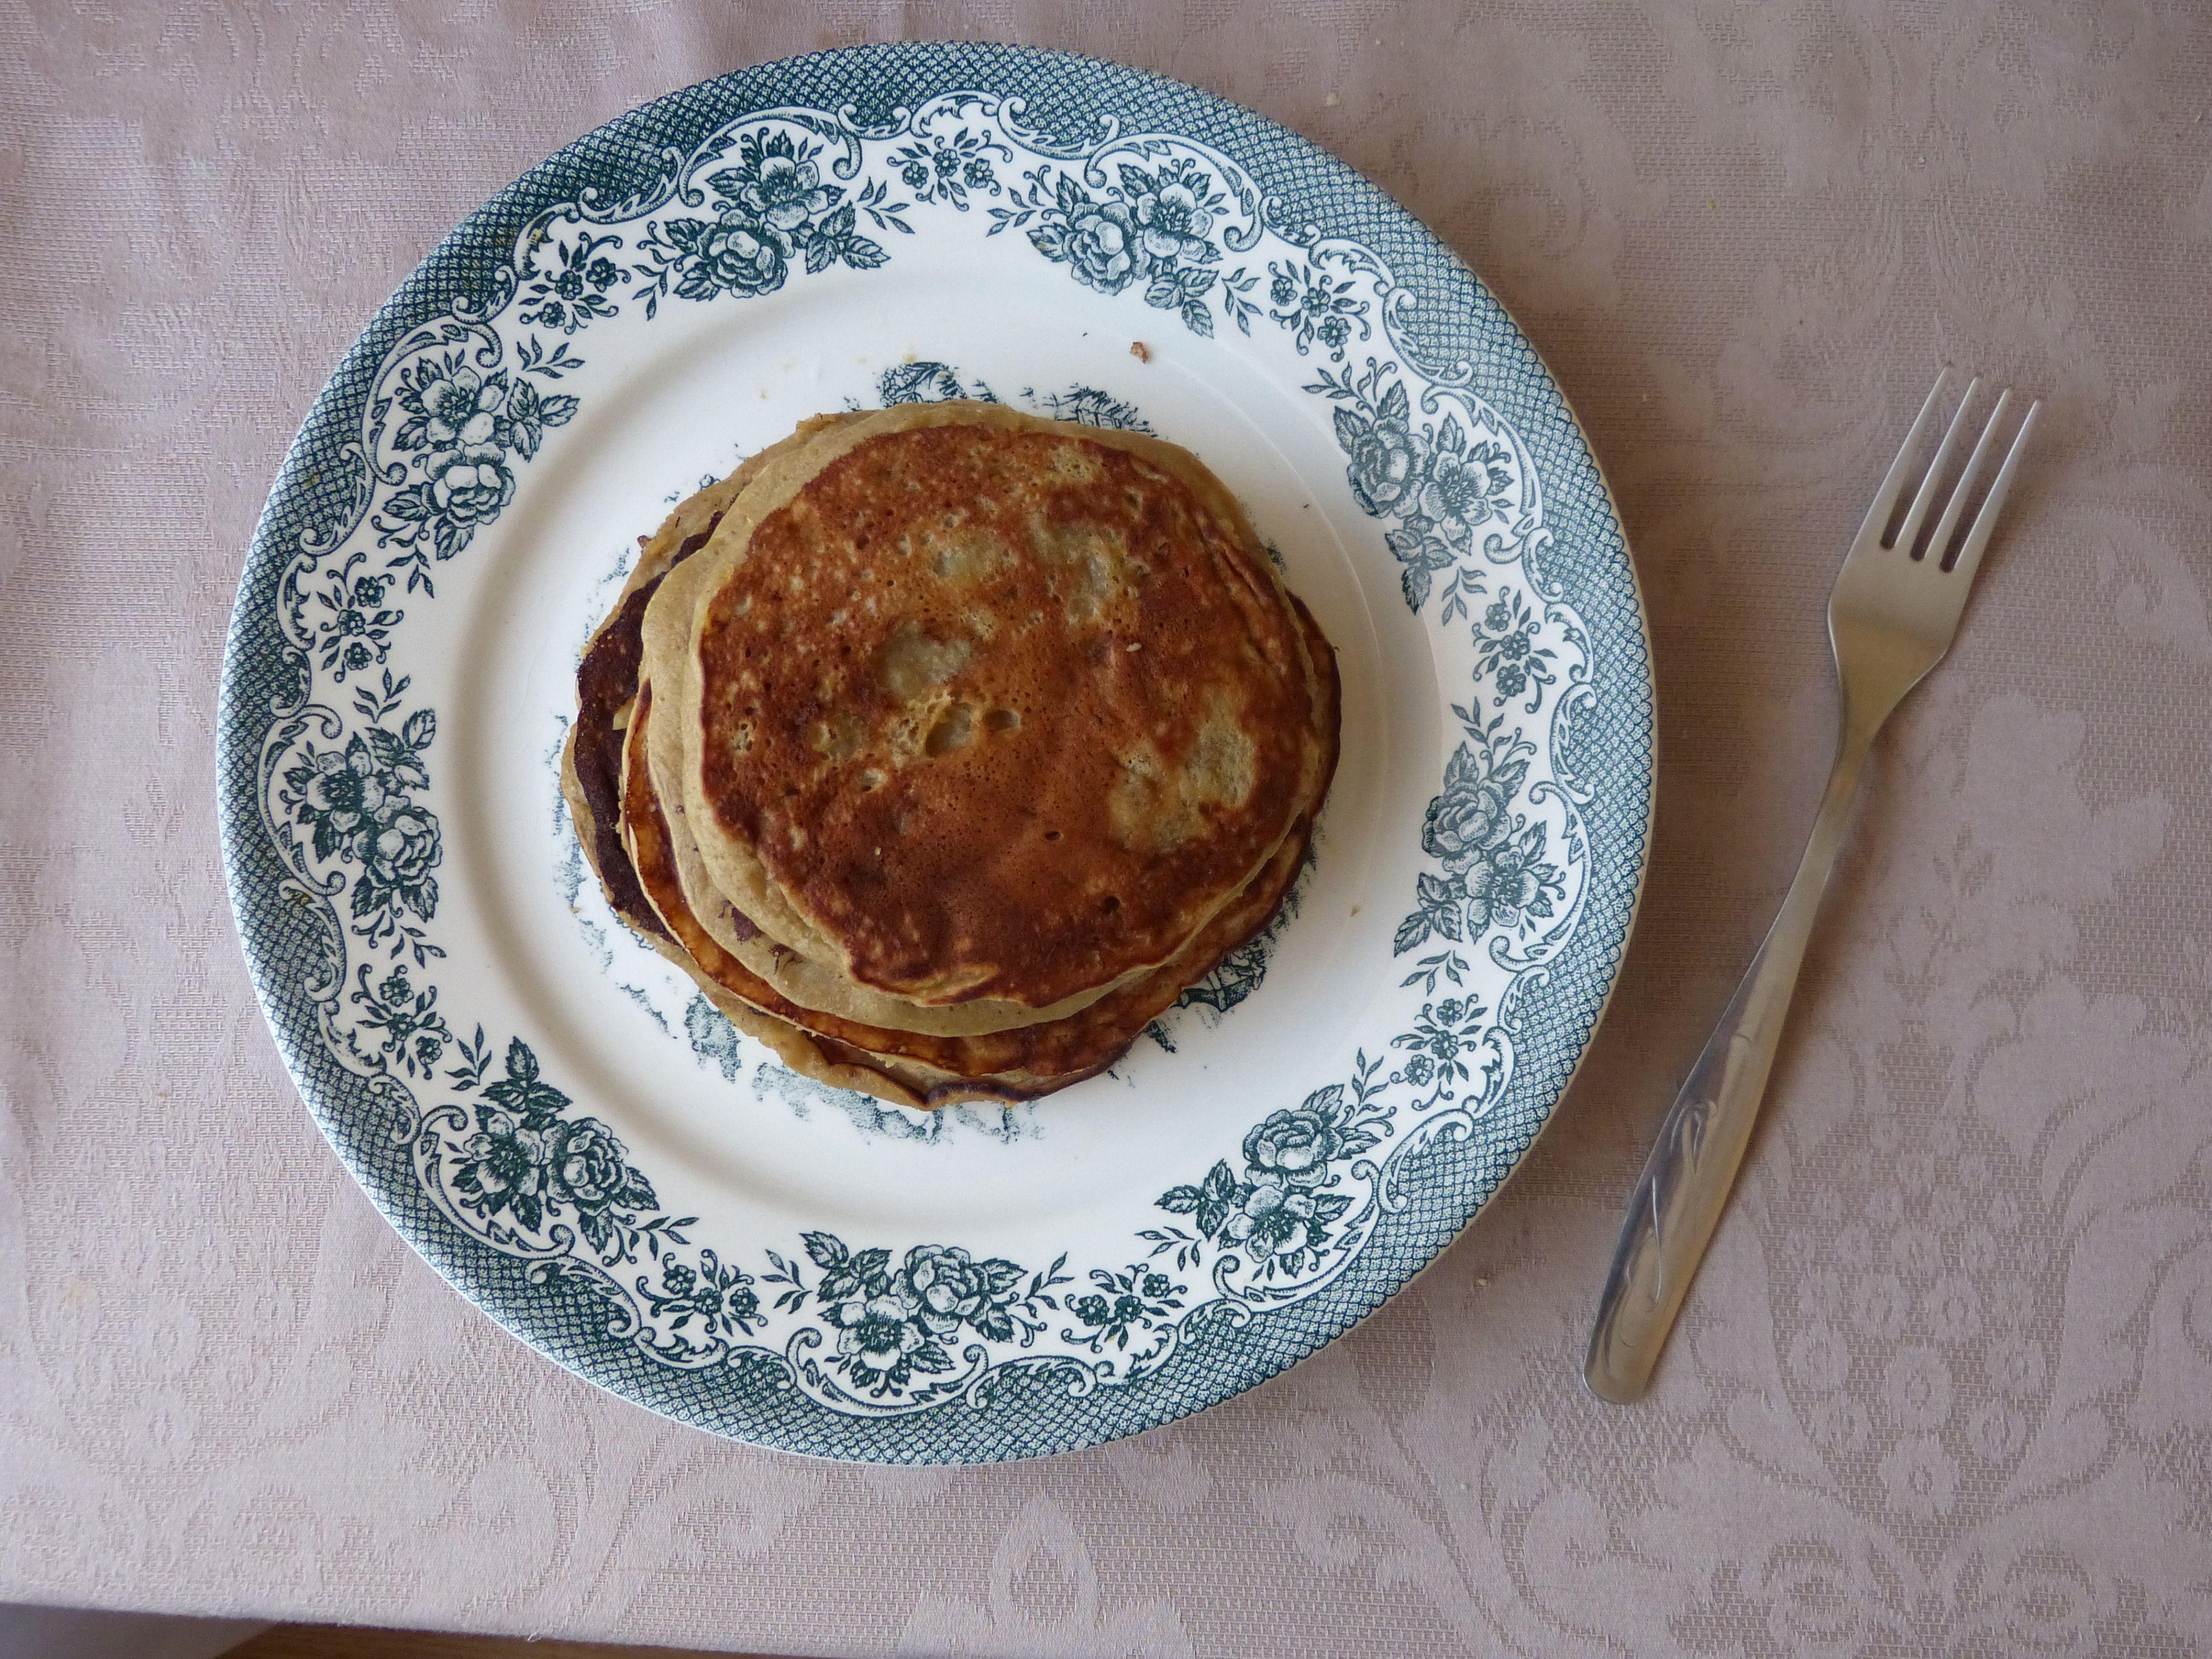 Banana and coconut milk pancakes